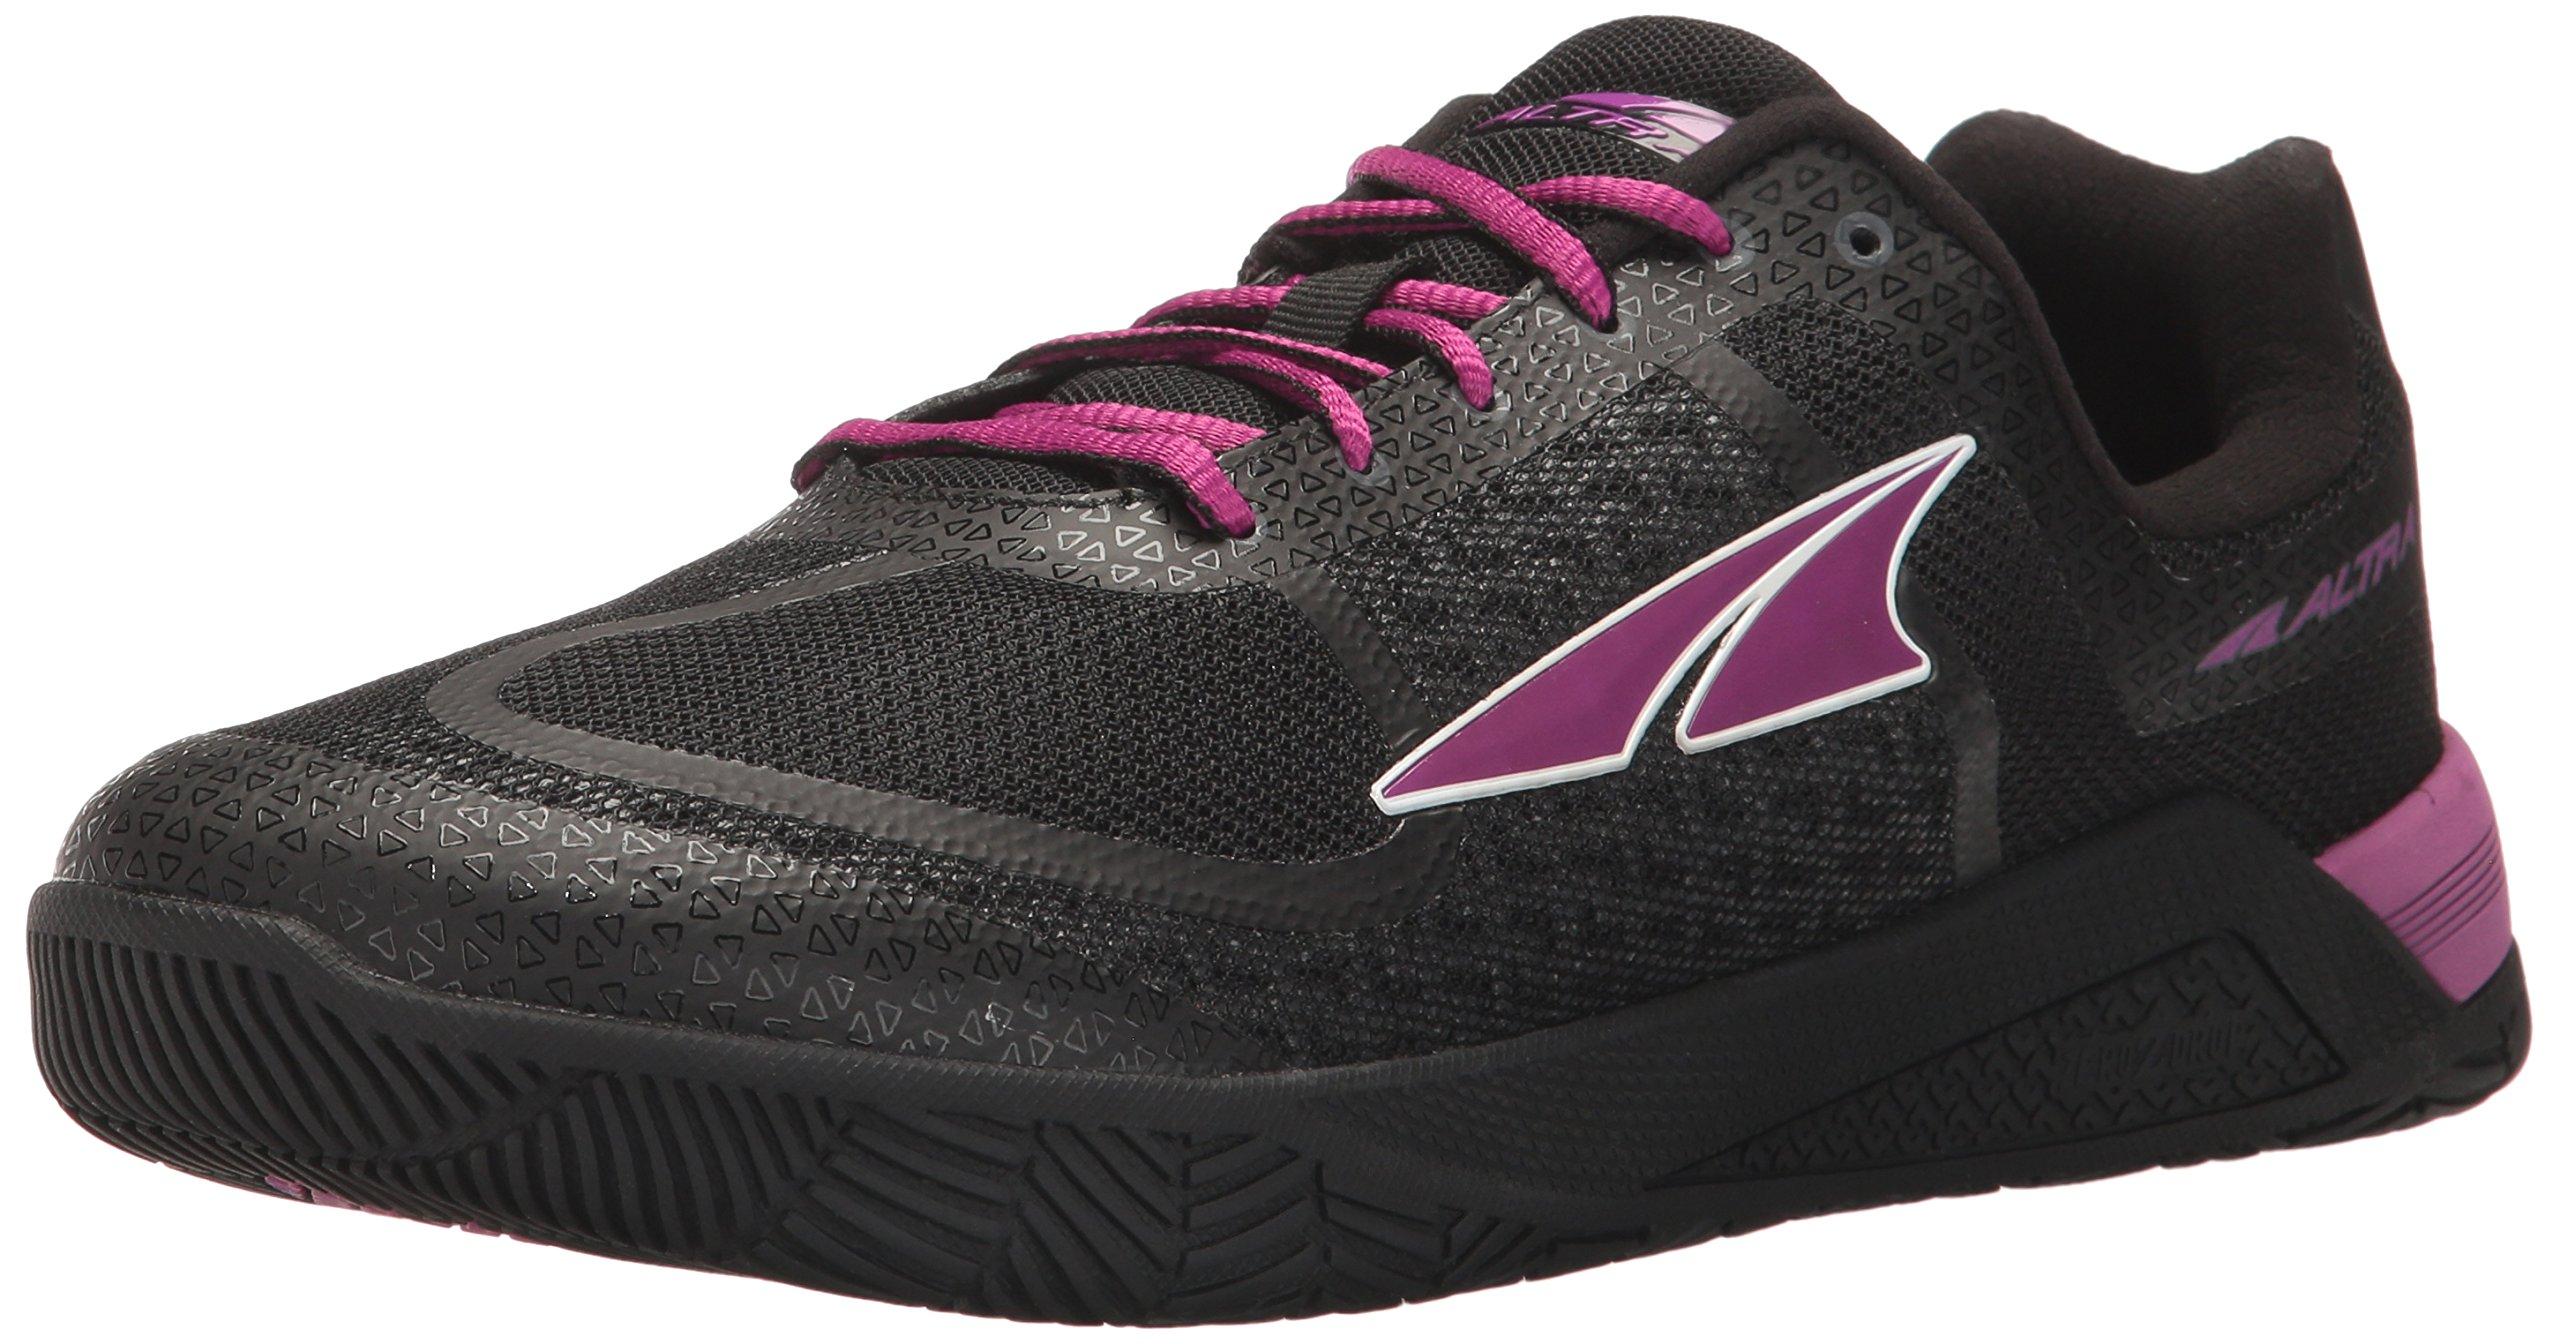 Altra AFW1776P Women's HIIT XT Cross Training Shoe, Black/Purple - 8.5